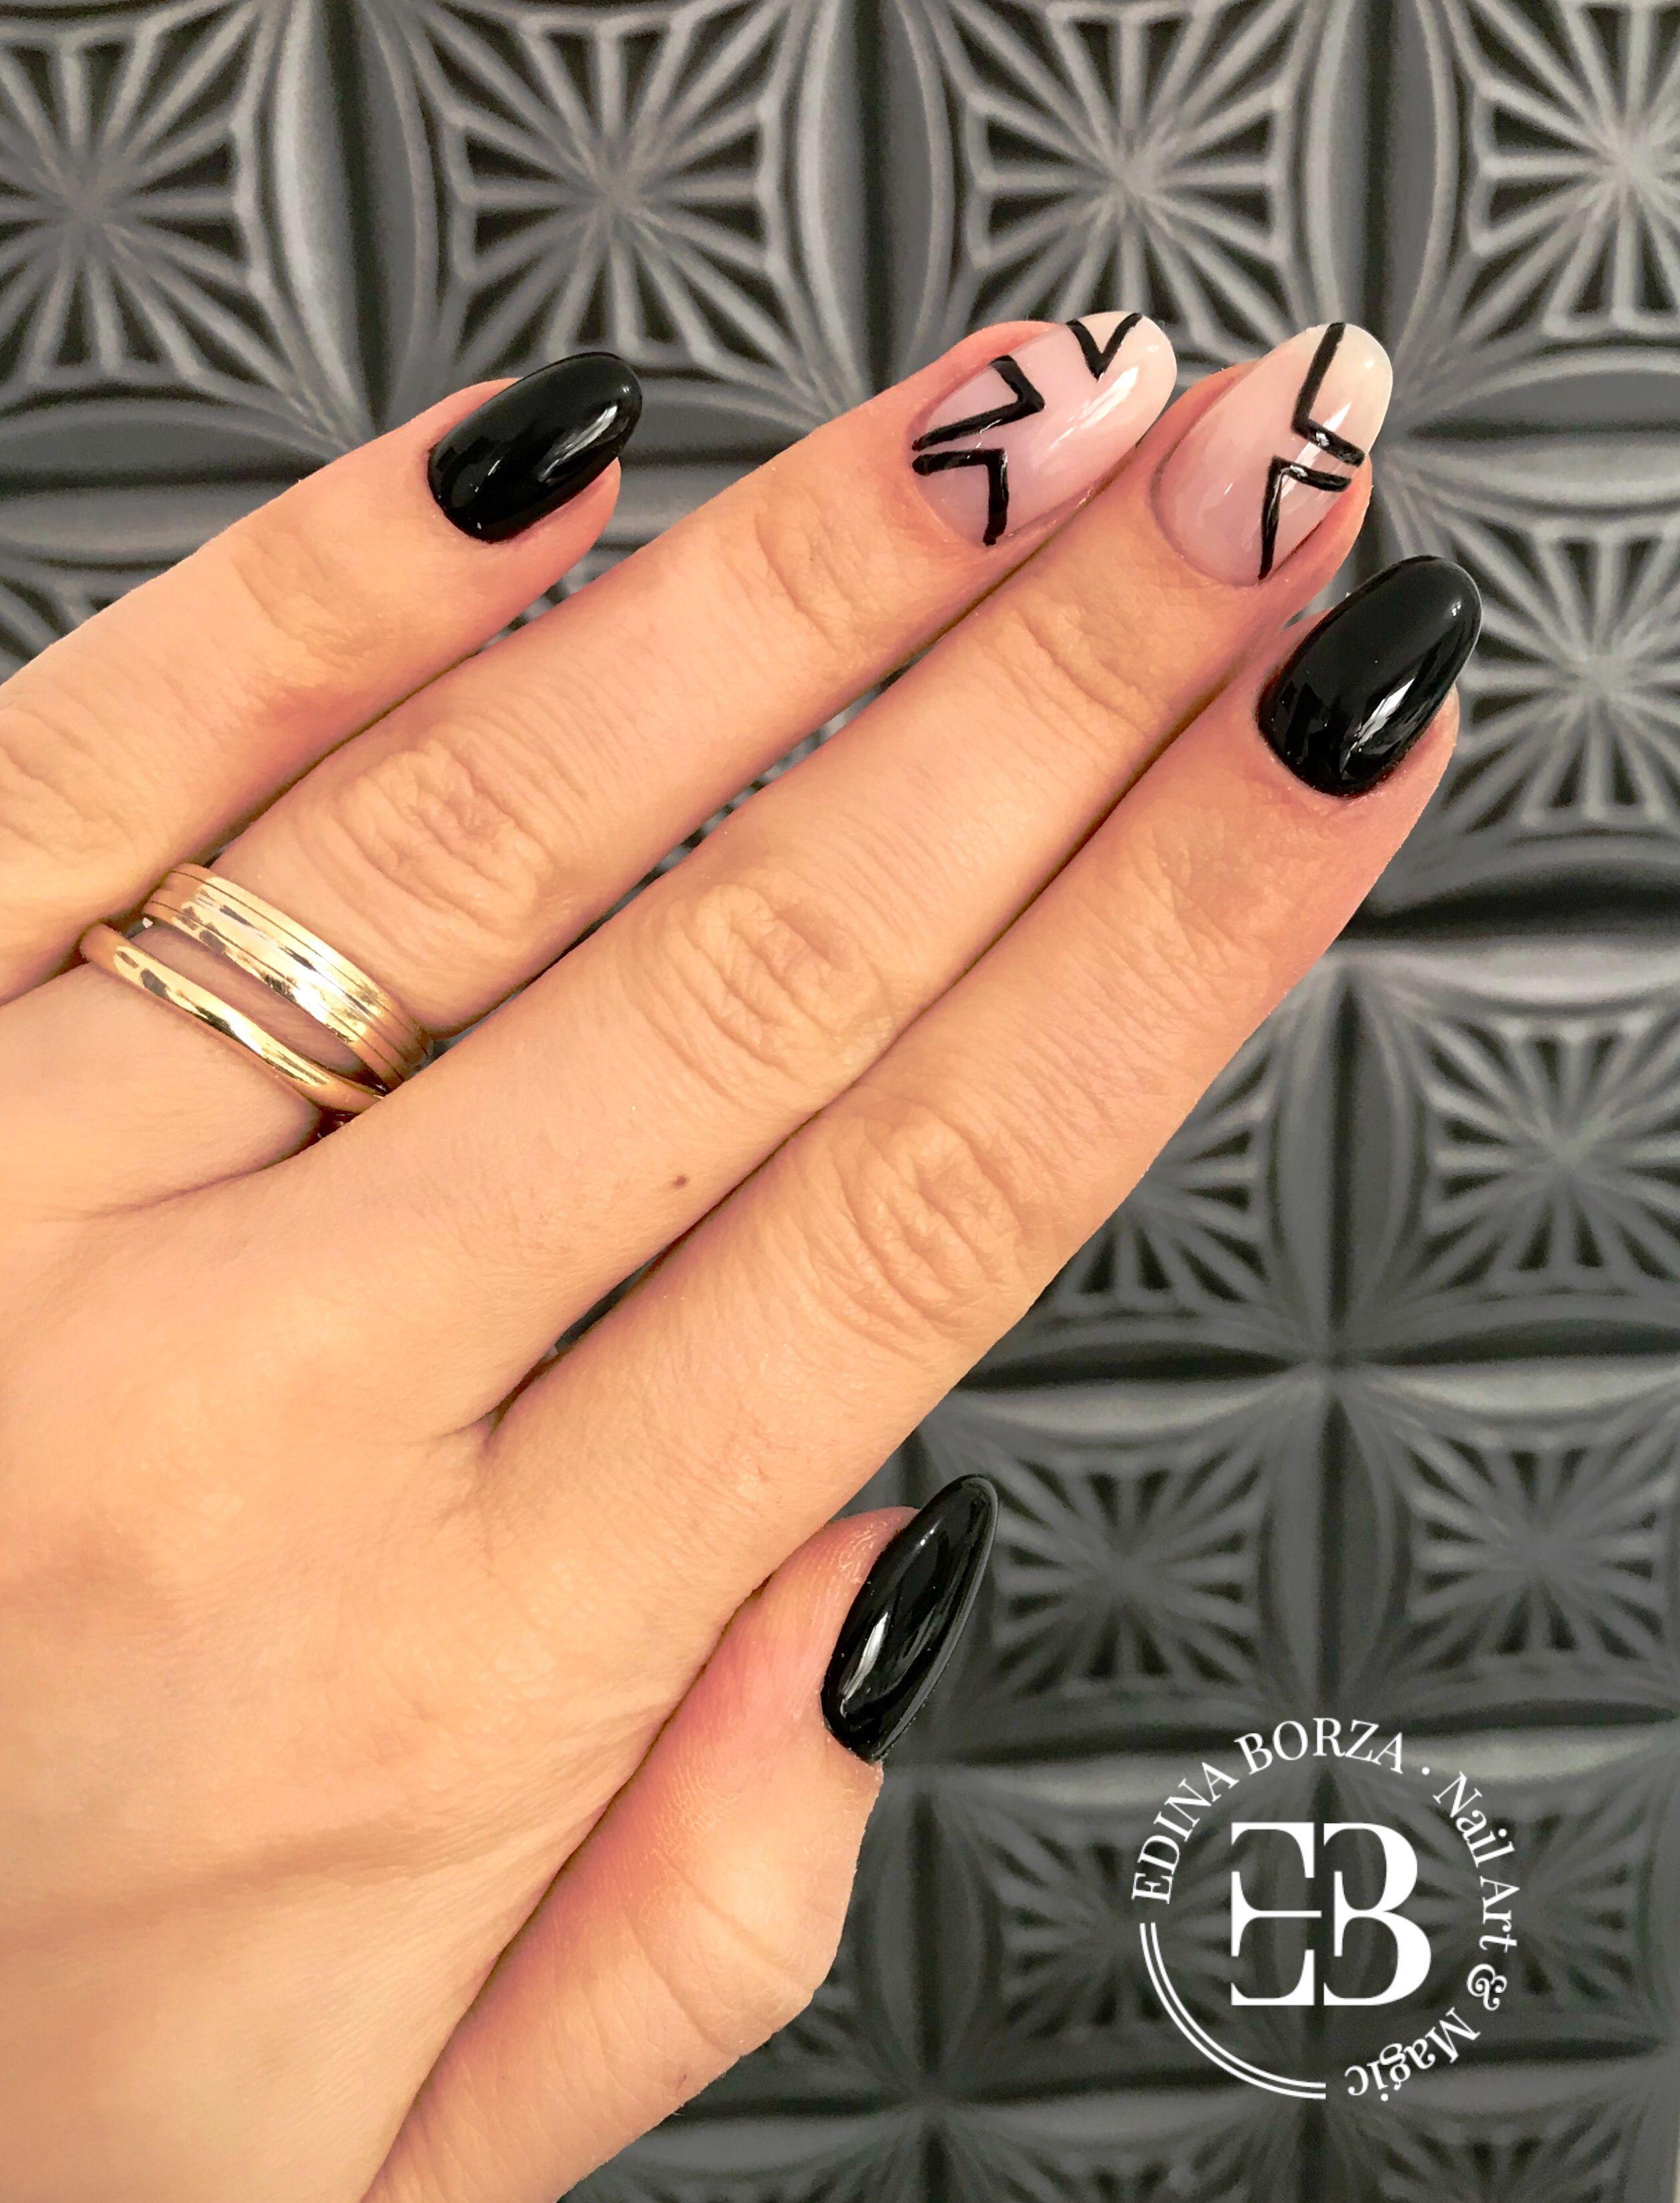 Nails by Edina Borza, Cluj Napoca, Romania Geometric black and nude ...